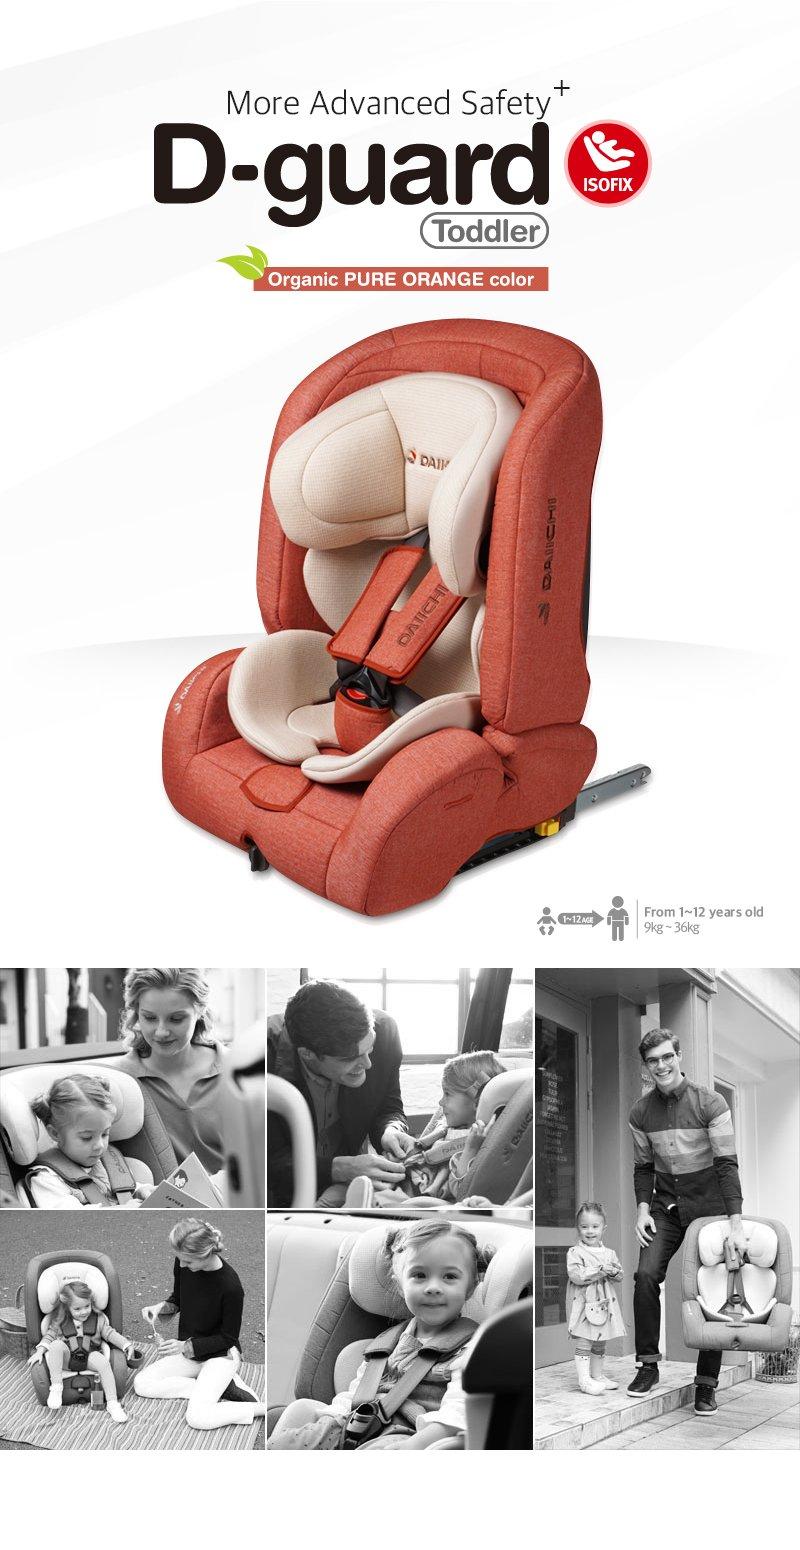 DAIICHI CAR SEAT D-GUARD TODDLER ORGANIC GRAY FIX-N